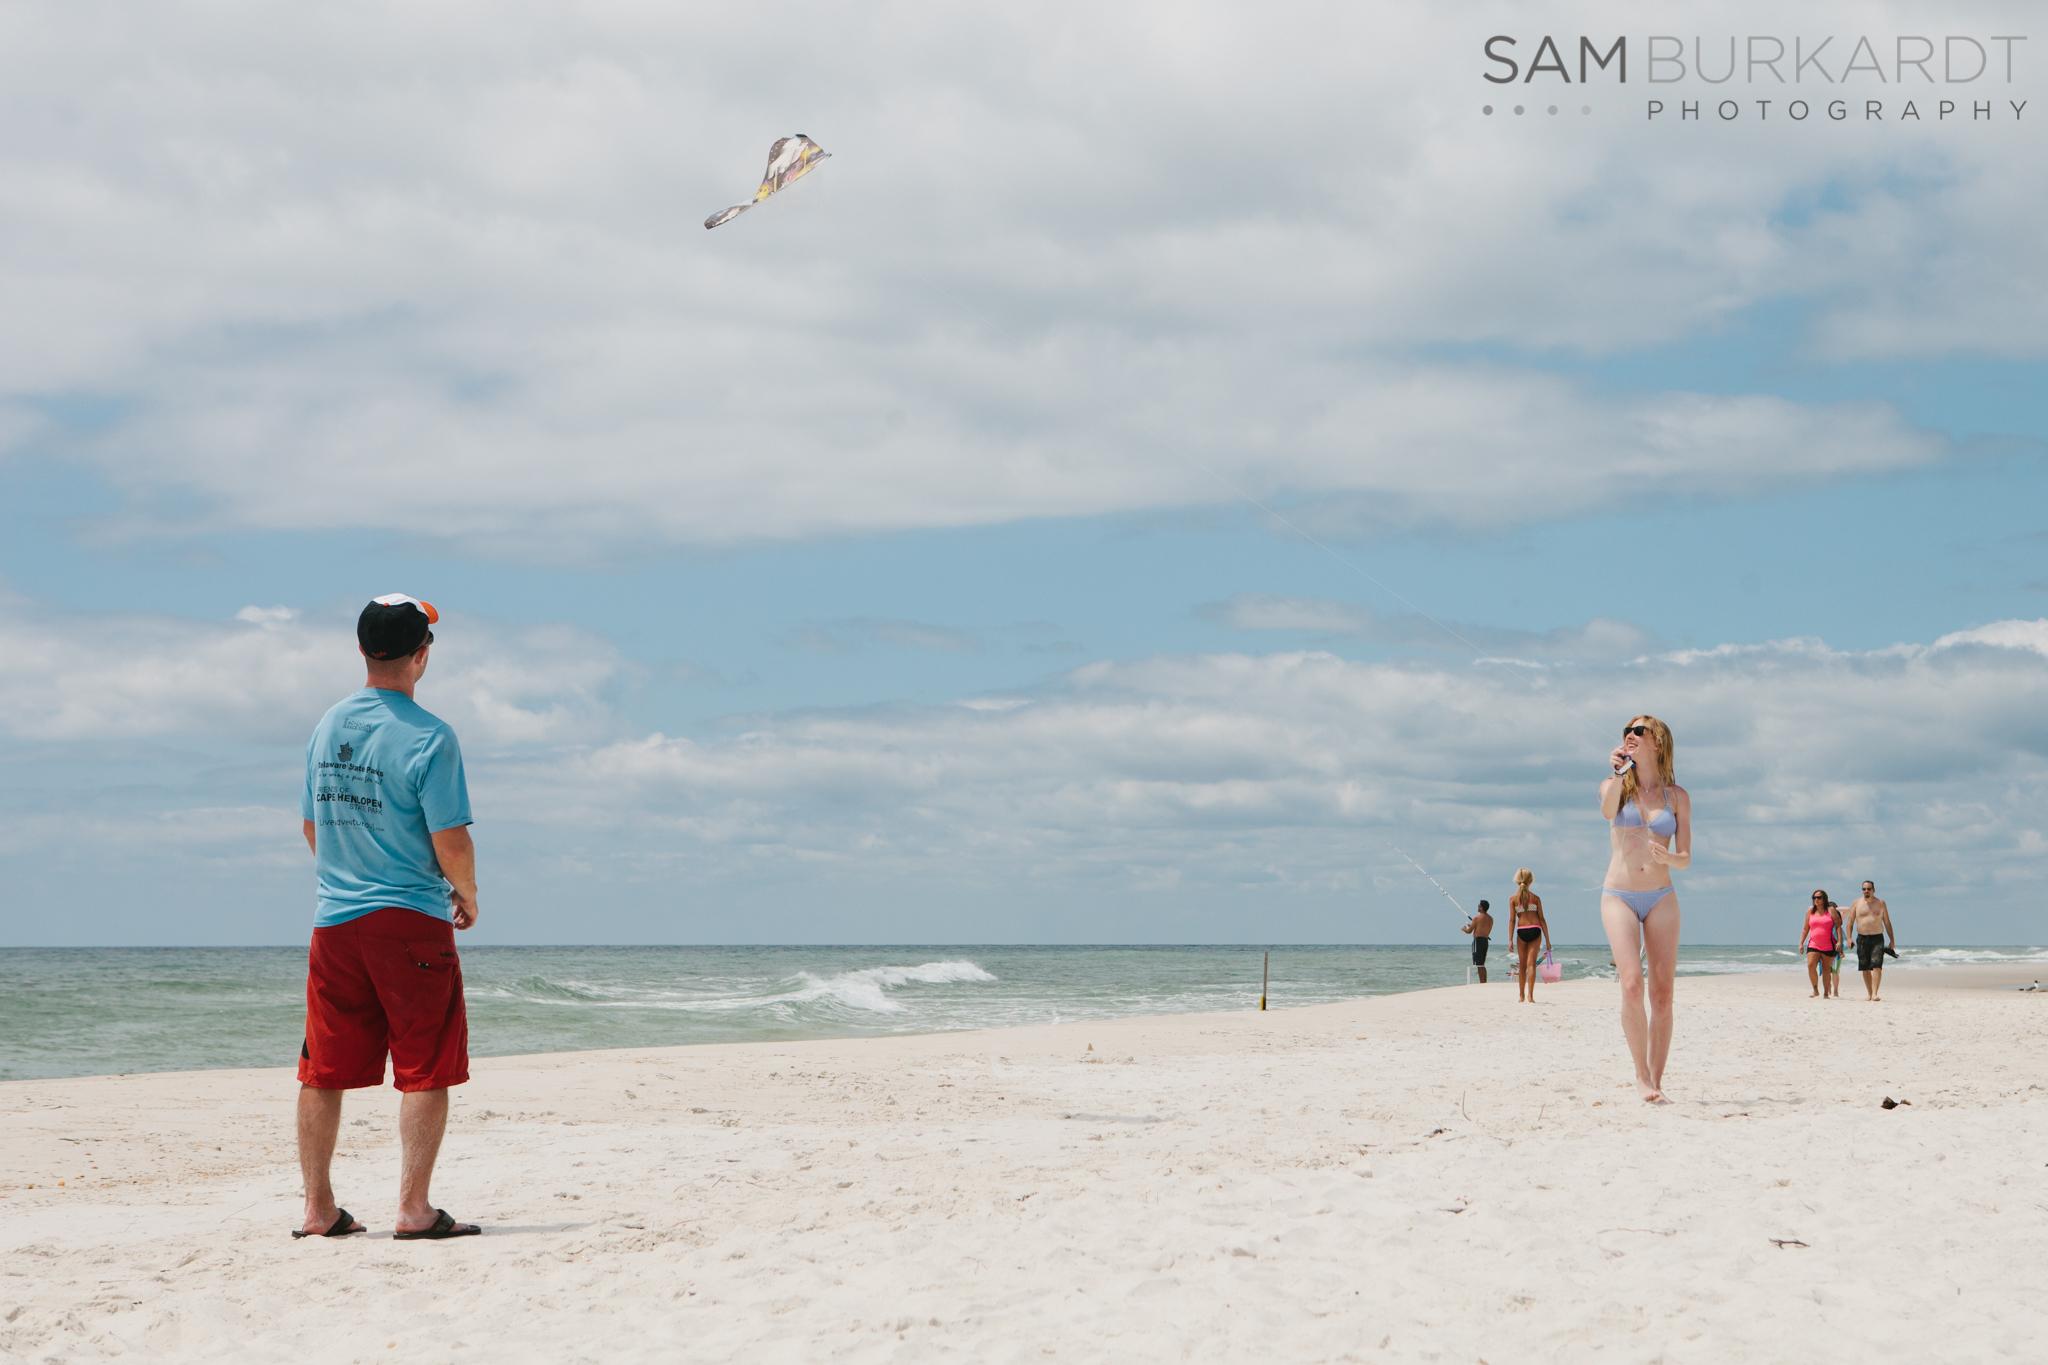 samburkardt_engagement_vacation_beach_cape_san_blas_florida_camping_gopro_0021.jpg